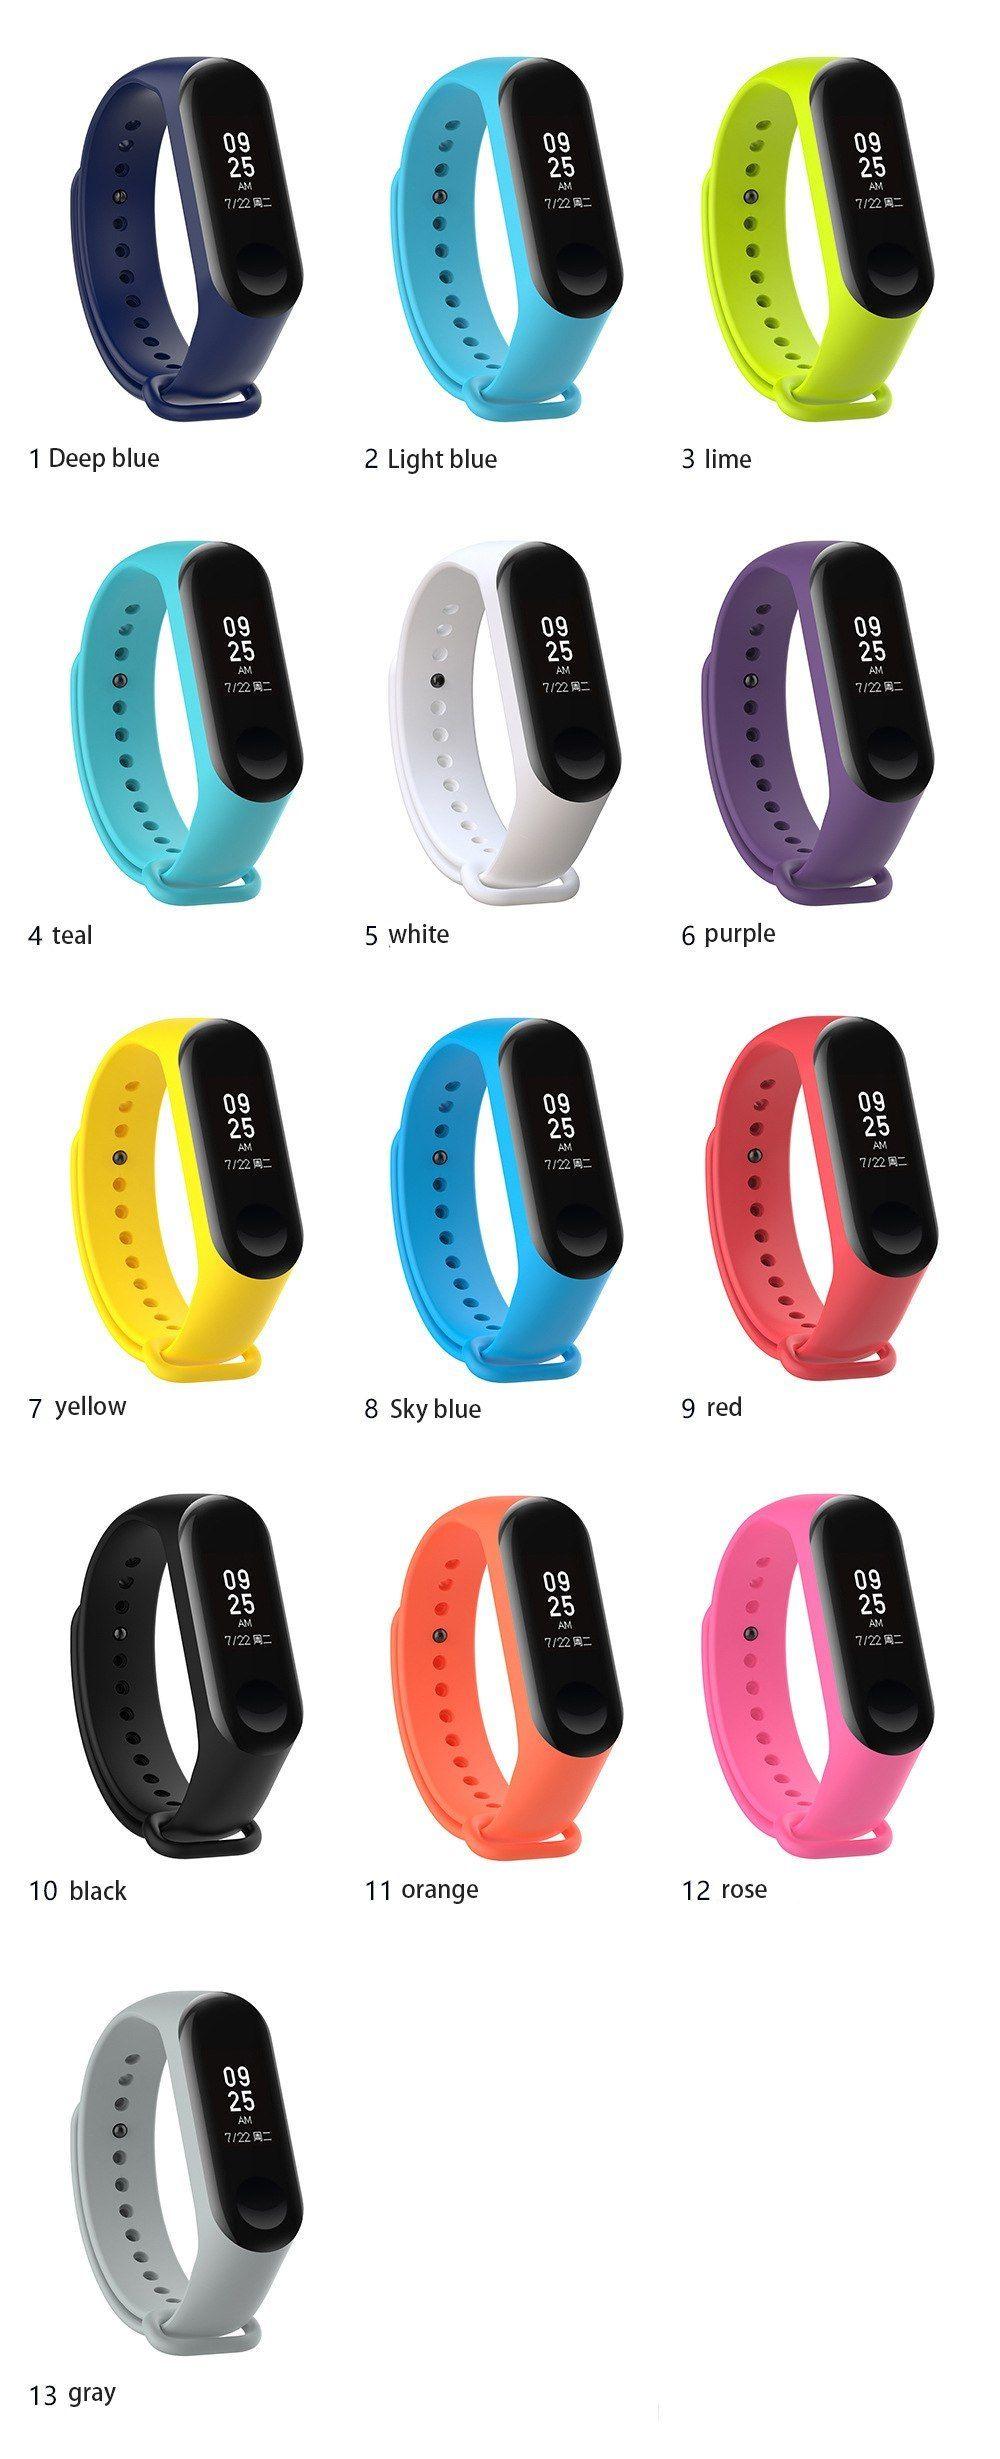 Bracelet For Xiaomi Mi Band 3 Sport Strap Watch Silicone Wrist Strap For Xiaomi Mi Band 3 Accessories Bracelet Miband 3 Strap Relogios Mulher Magra